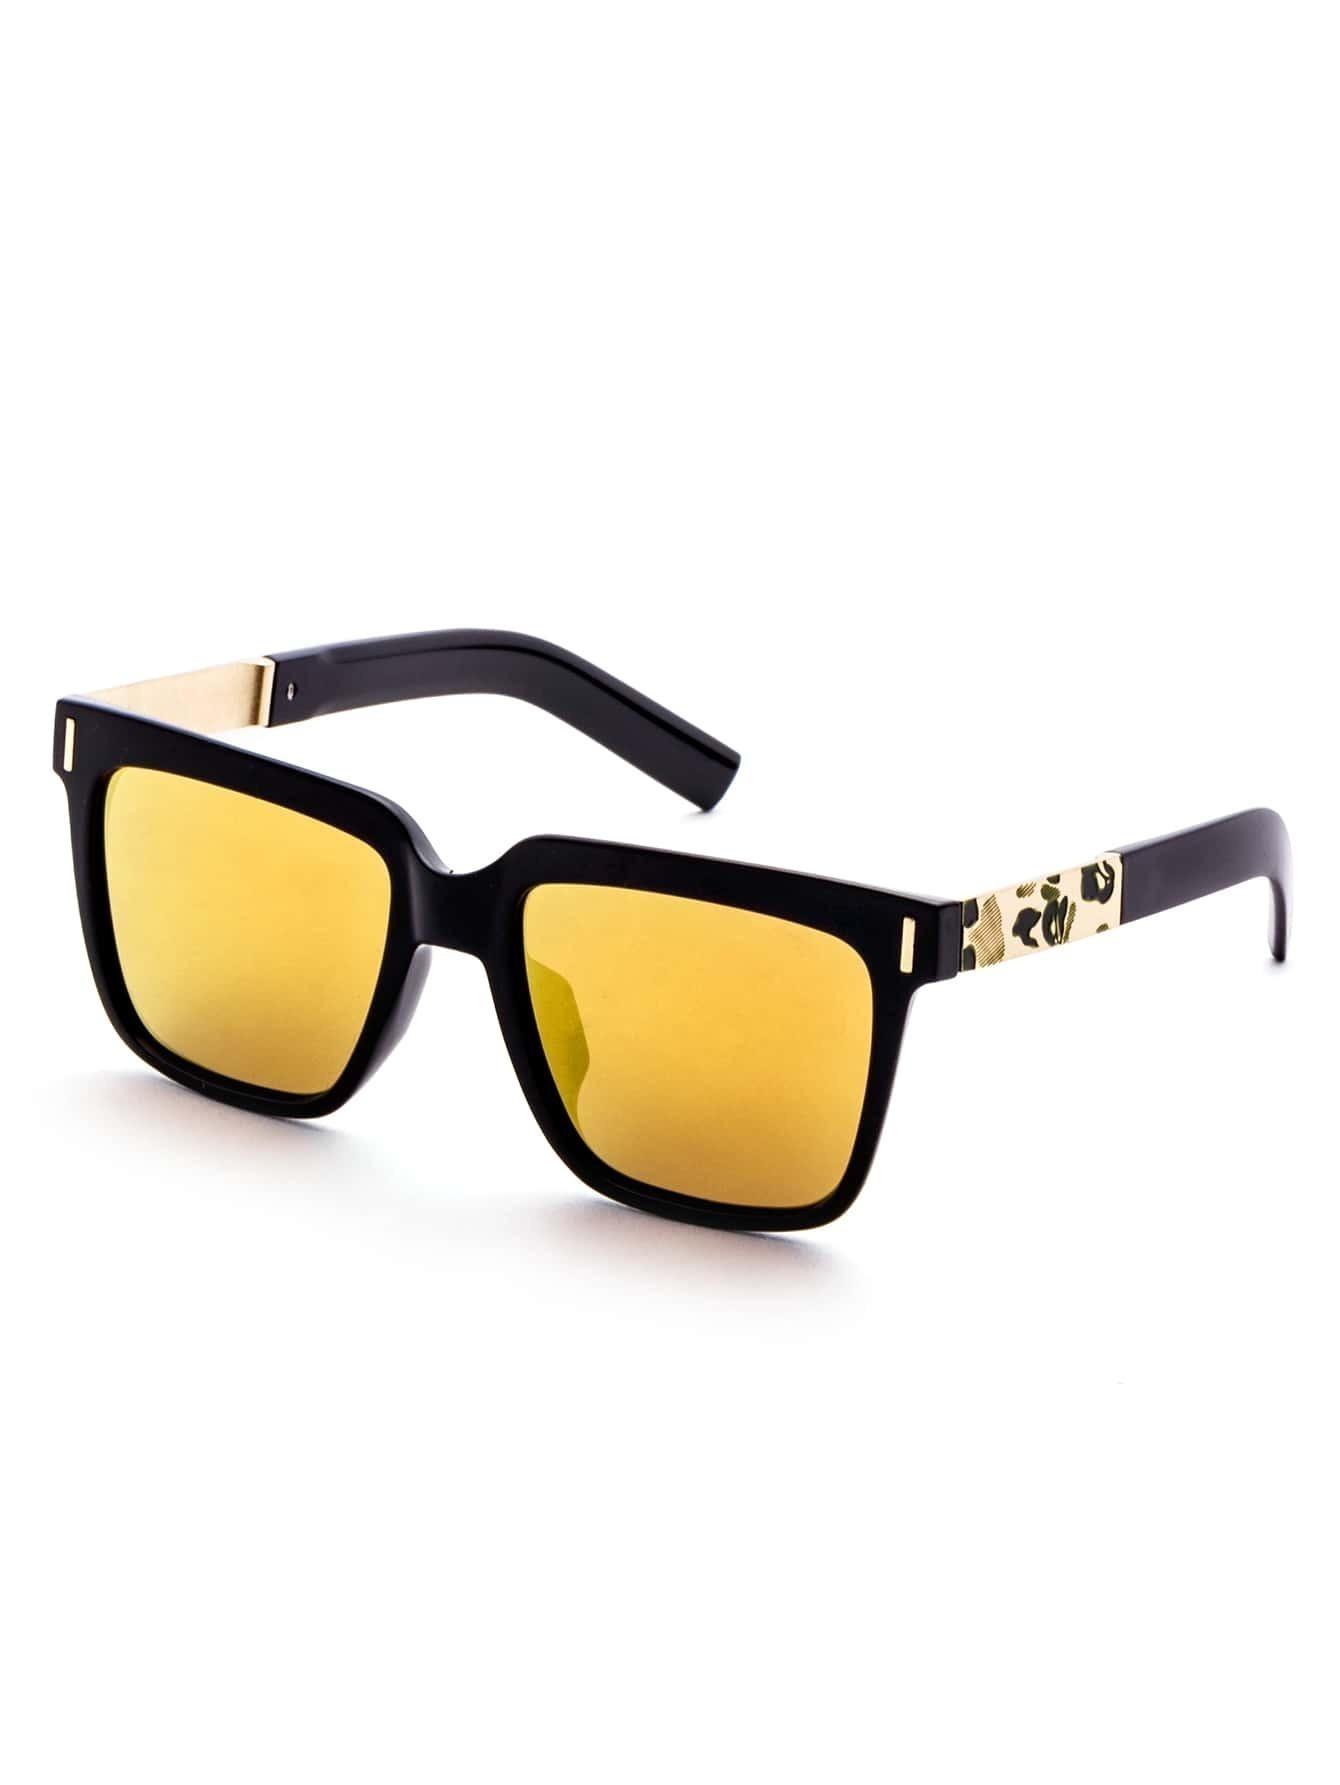 Black Frame Yellow Lens Metal Trim Sunglasses